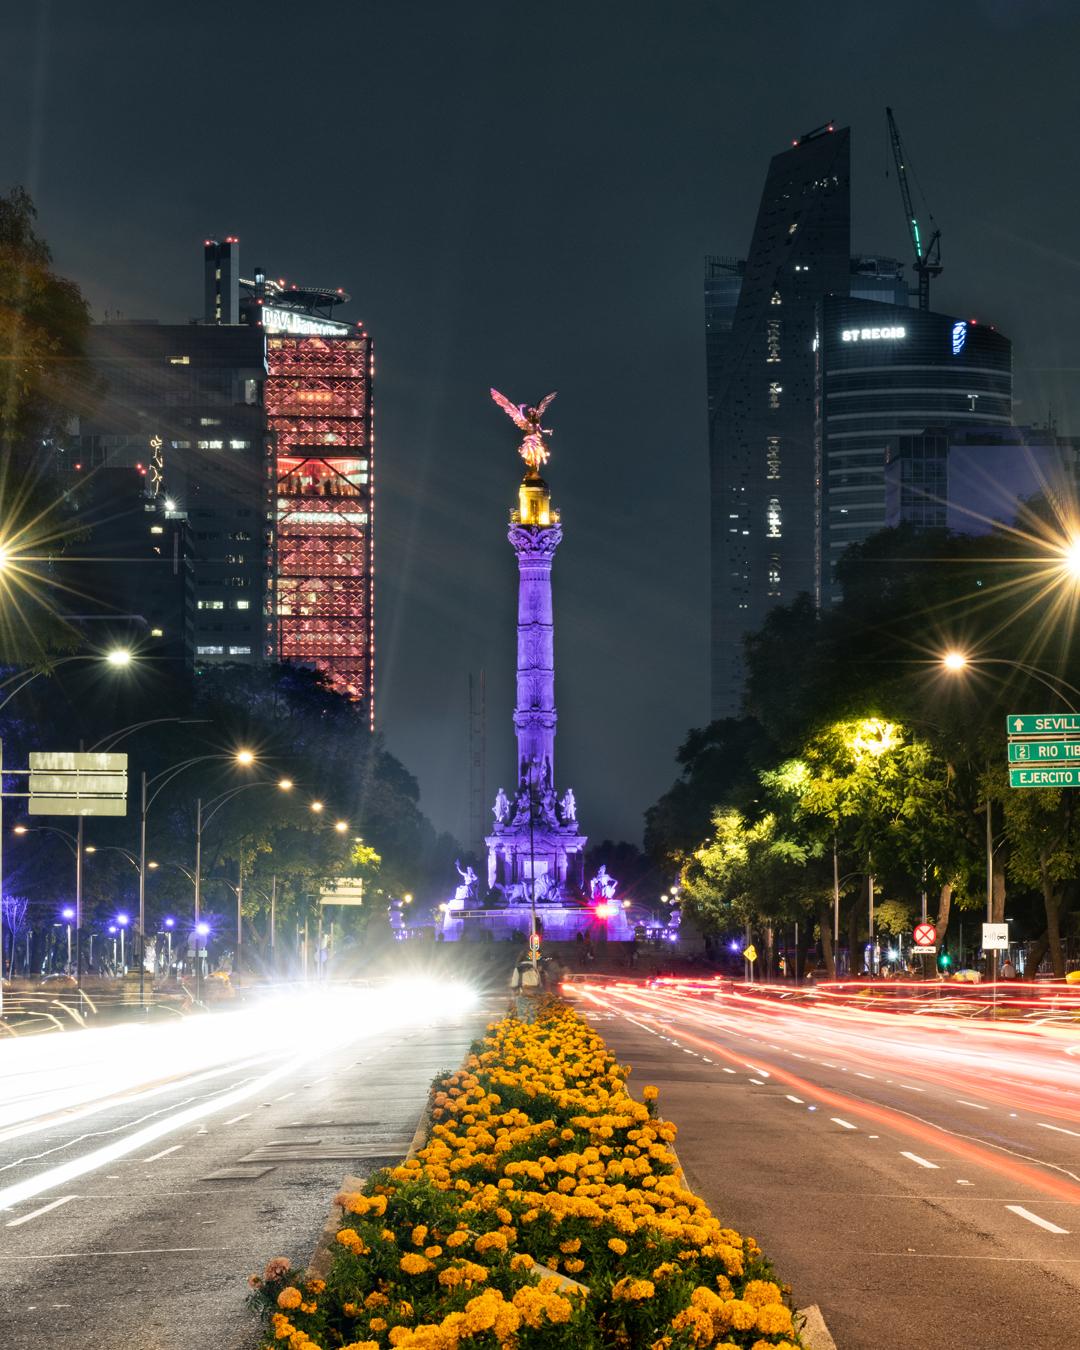 Mexico City - City Story 02.jpg